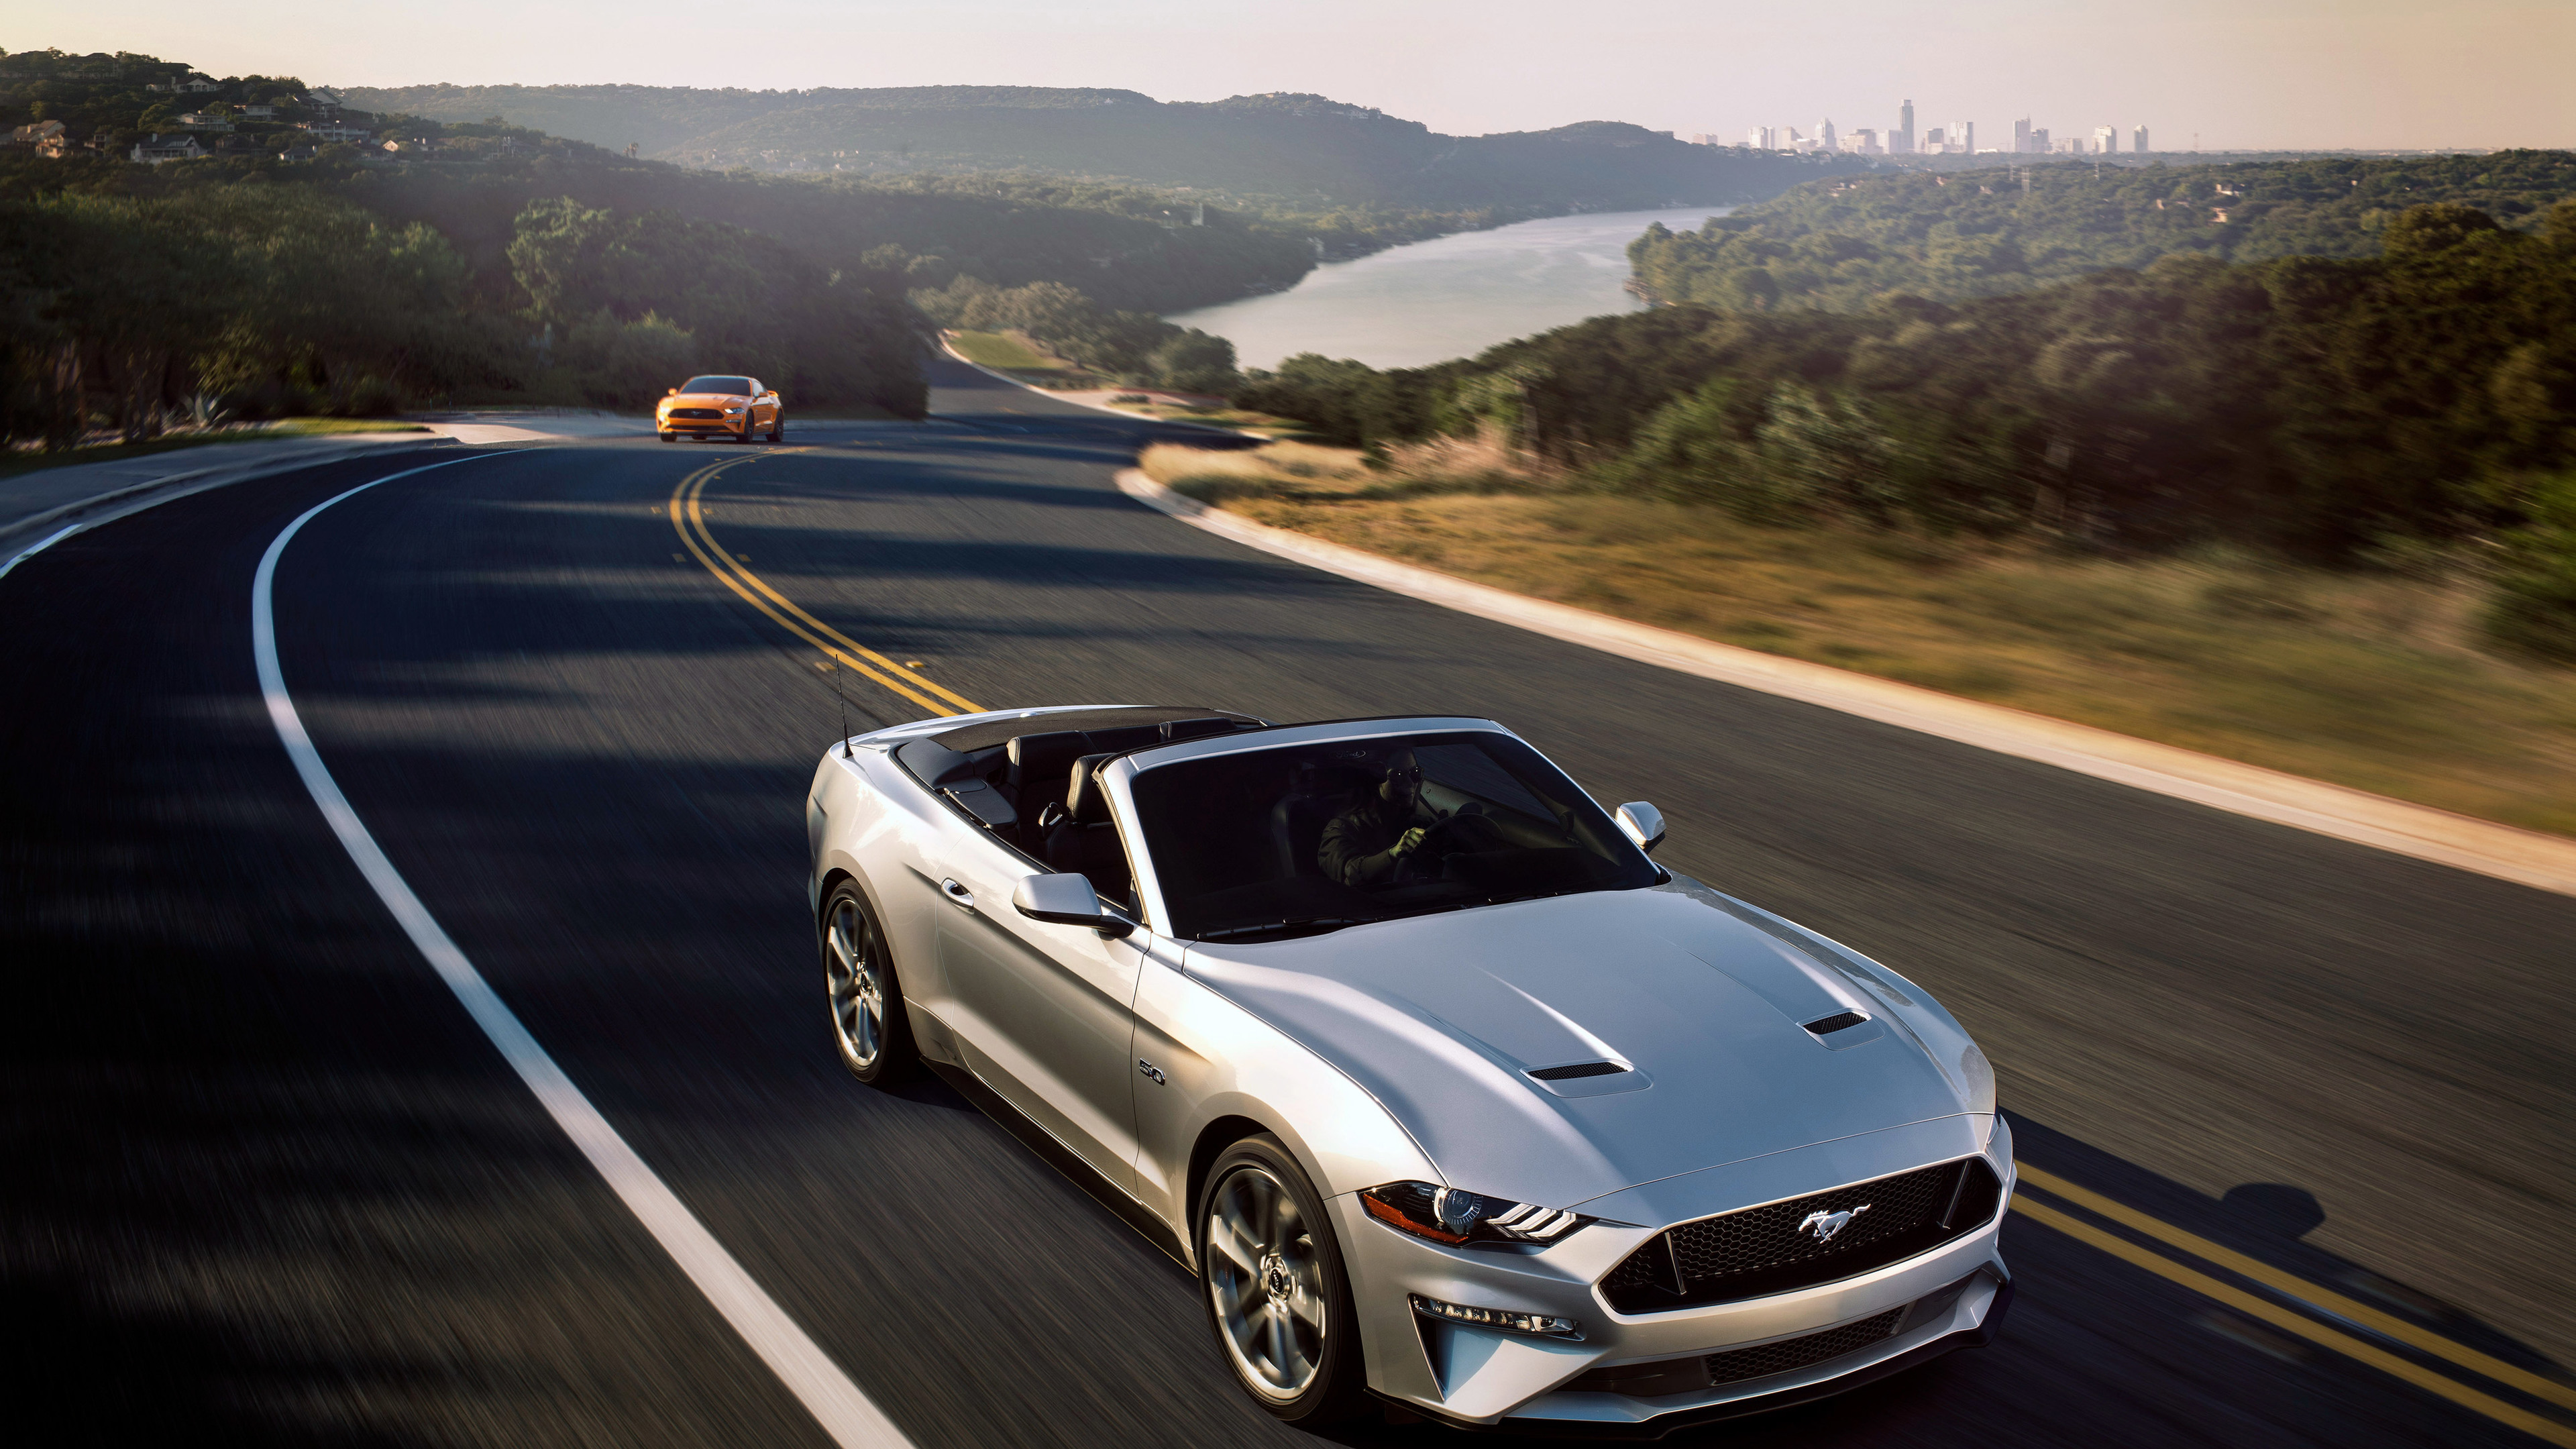 Wallpaper 4k Ford Mustang Gt Convertible 2018 4k 2018 Cars